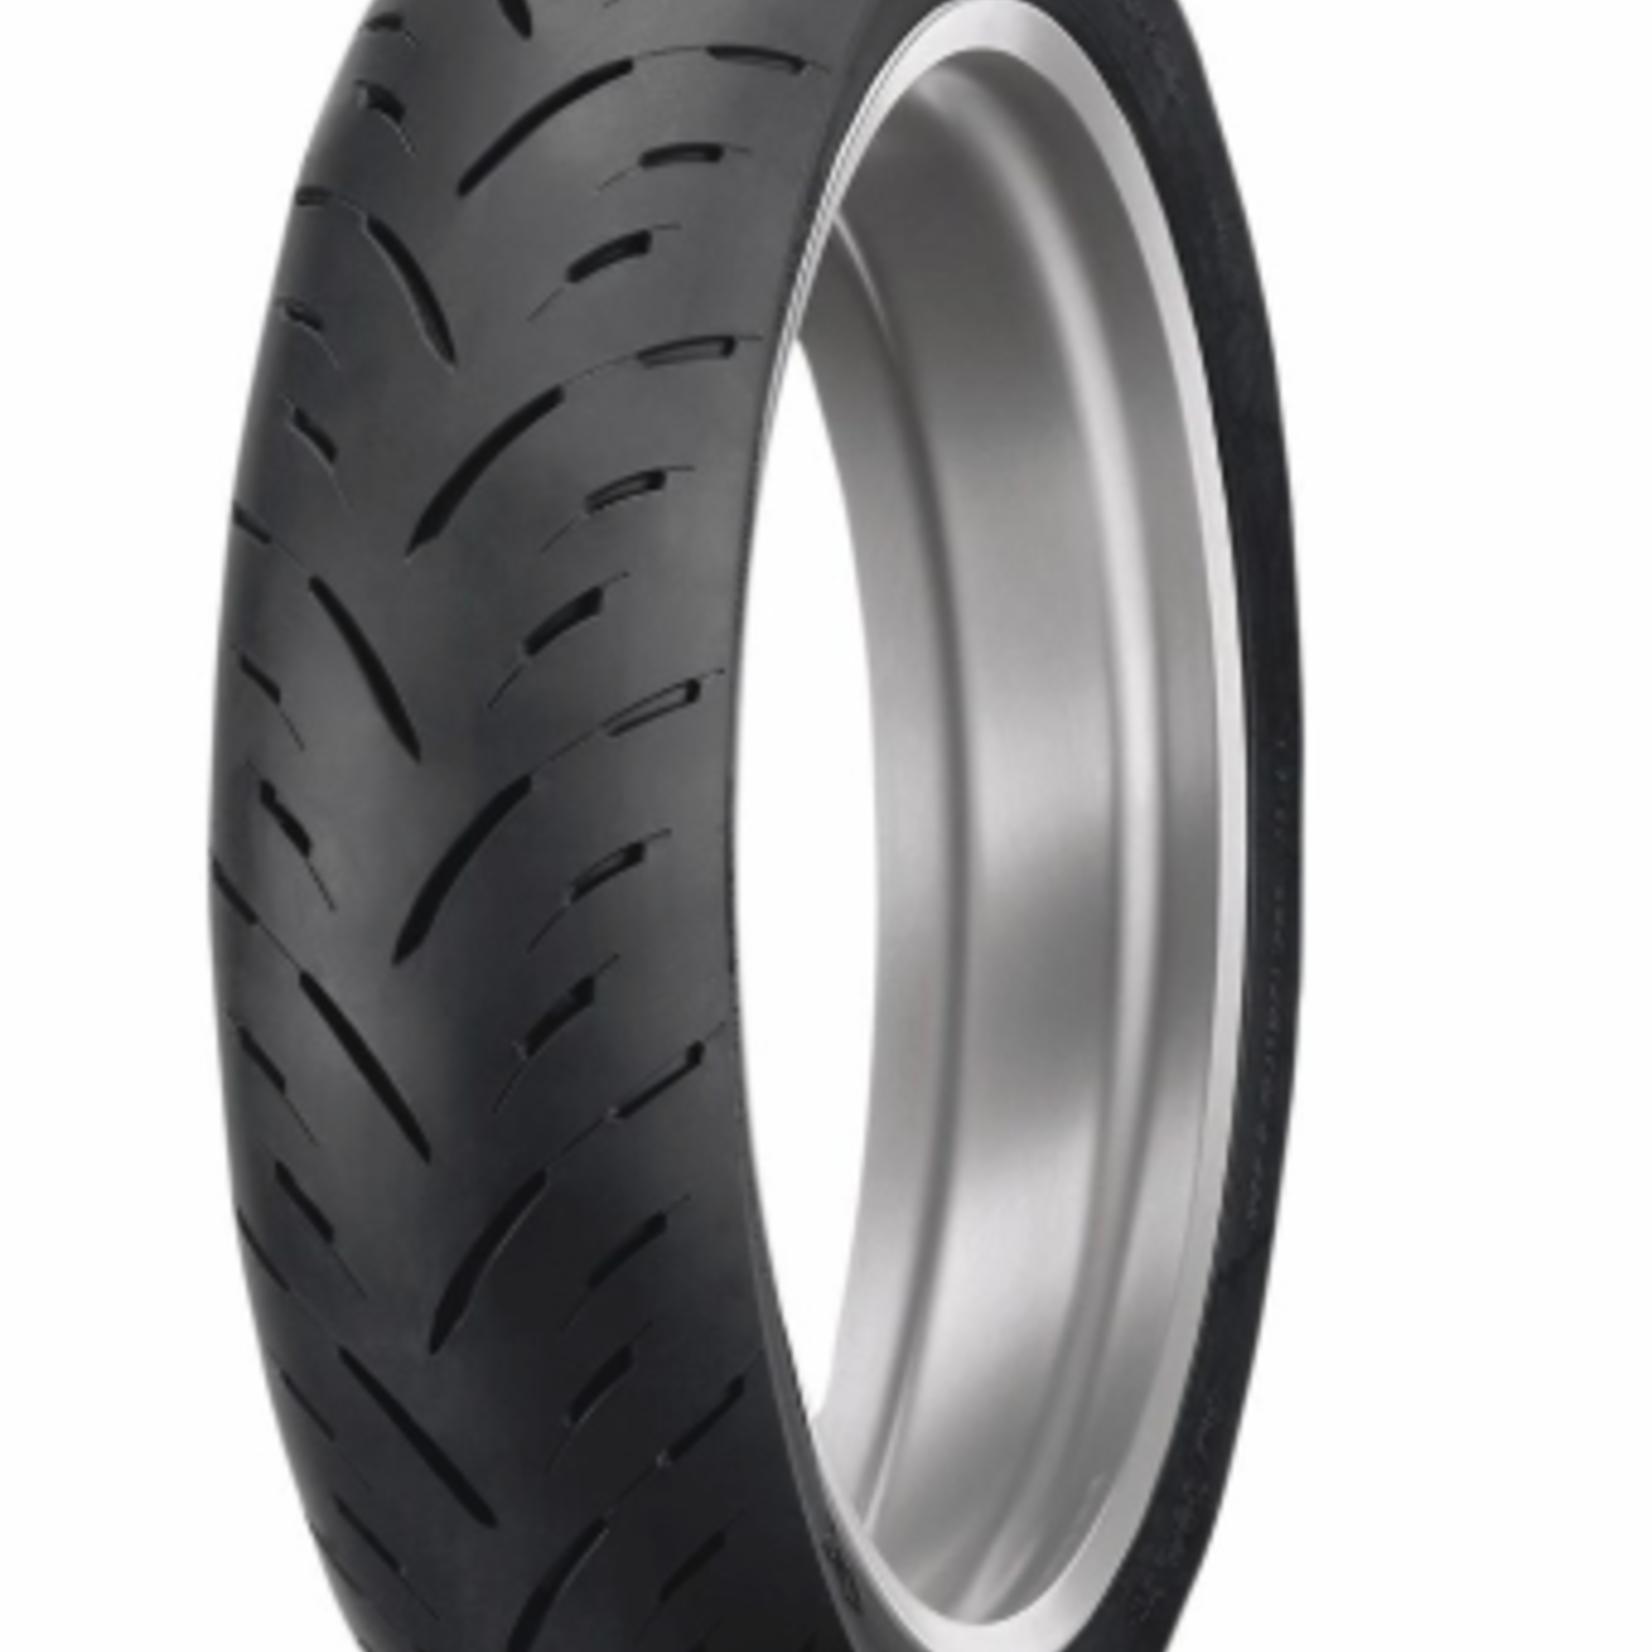 Dunlop Dunlop Sportmax GPR300 Rear Tire - 150/60-17